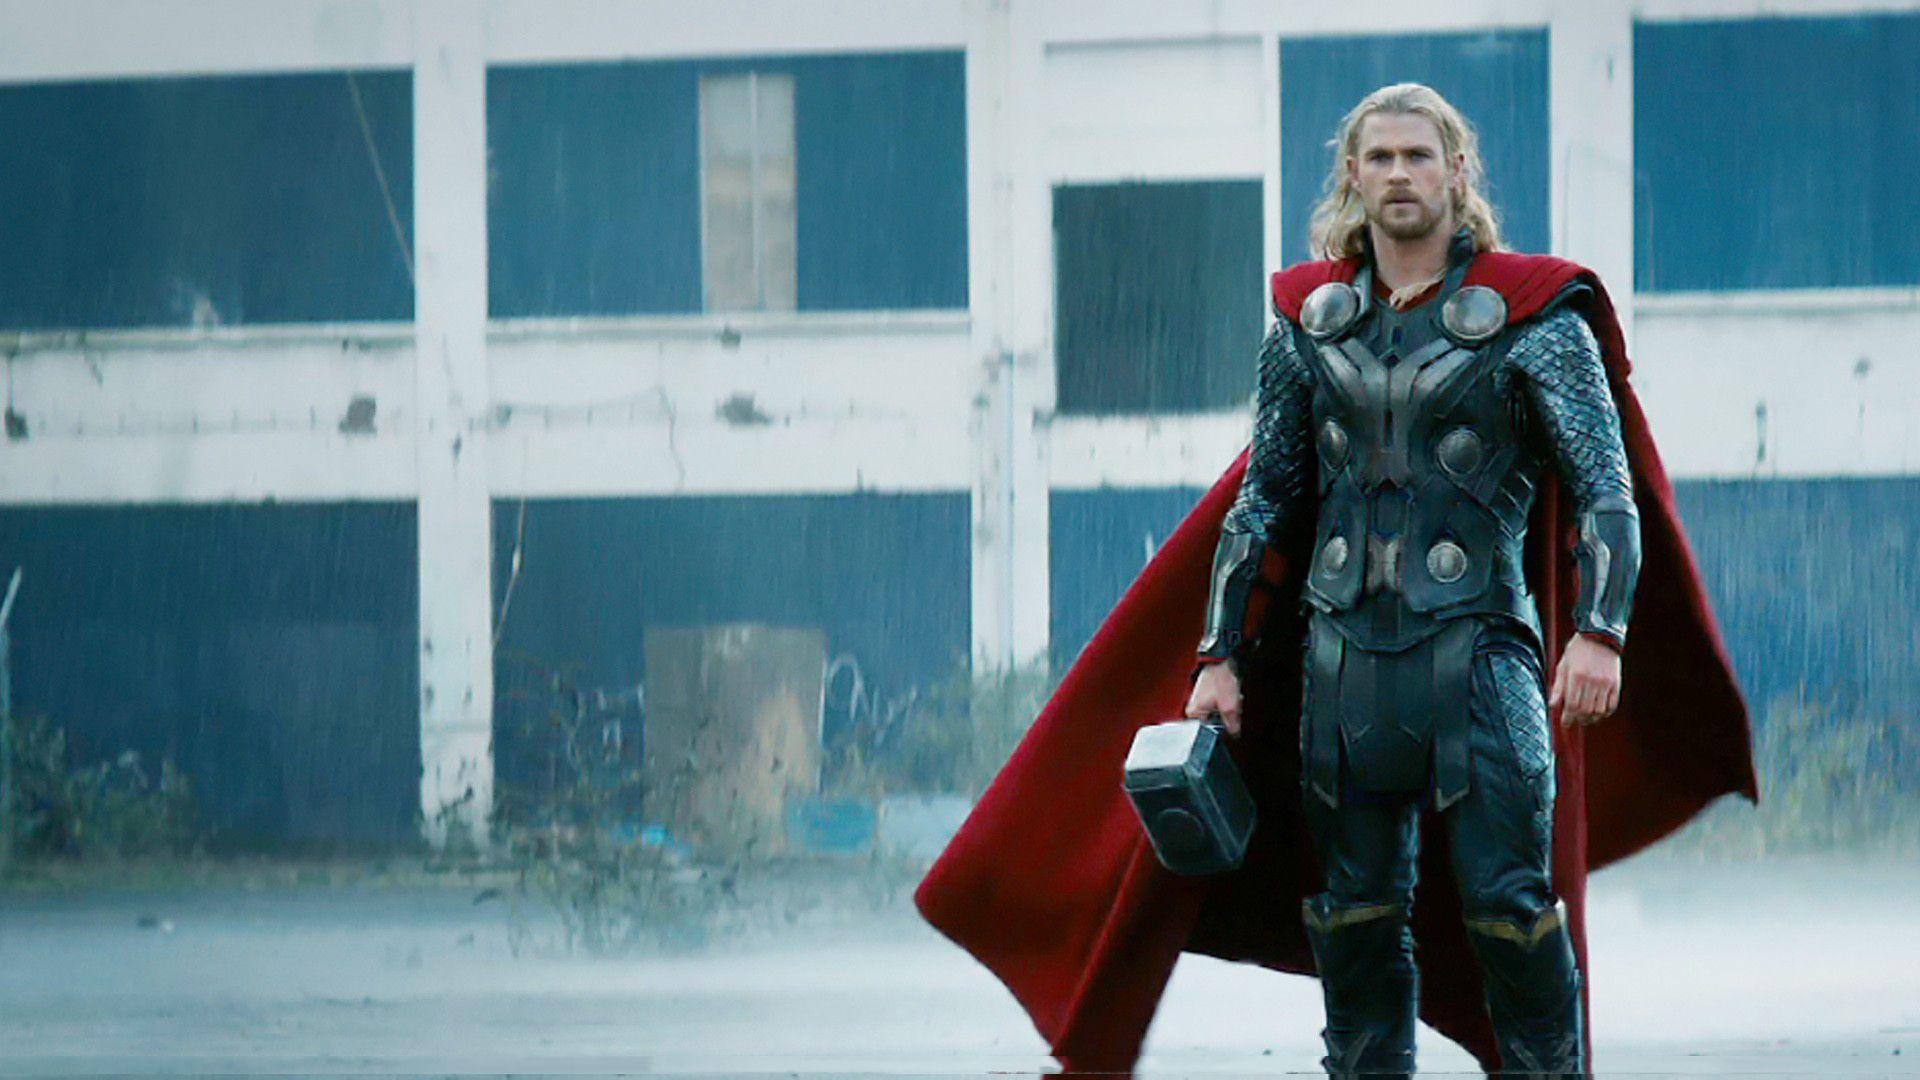 Thor The Dark World Thor The Dark World Hd Wallpapers Categories